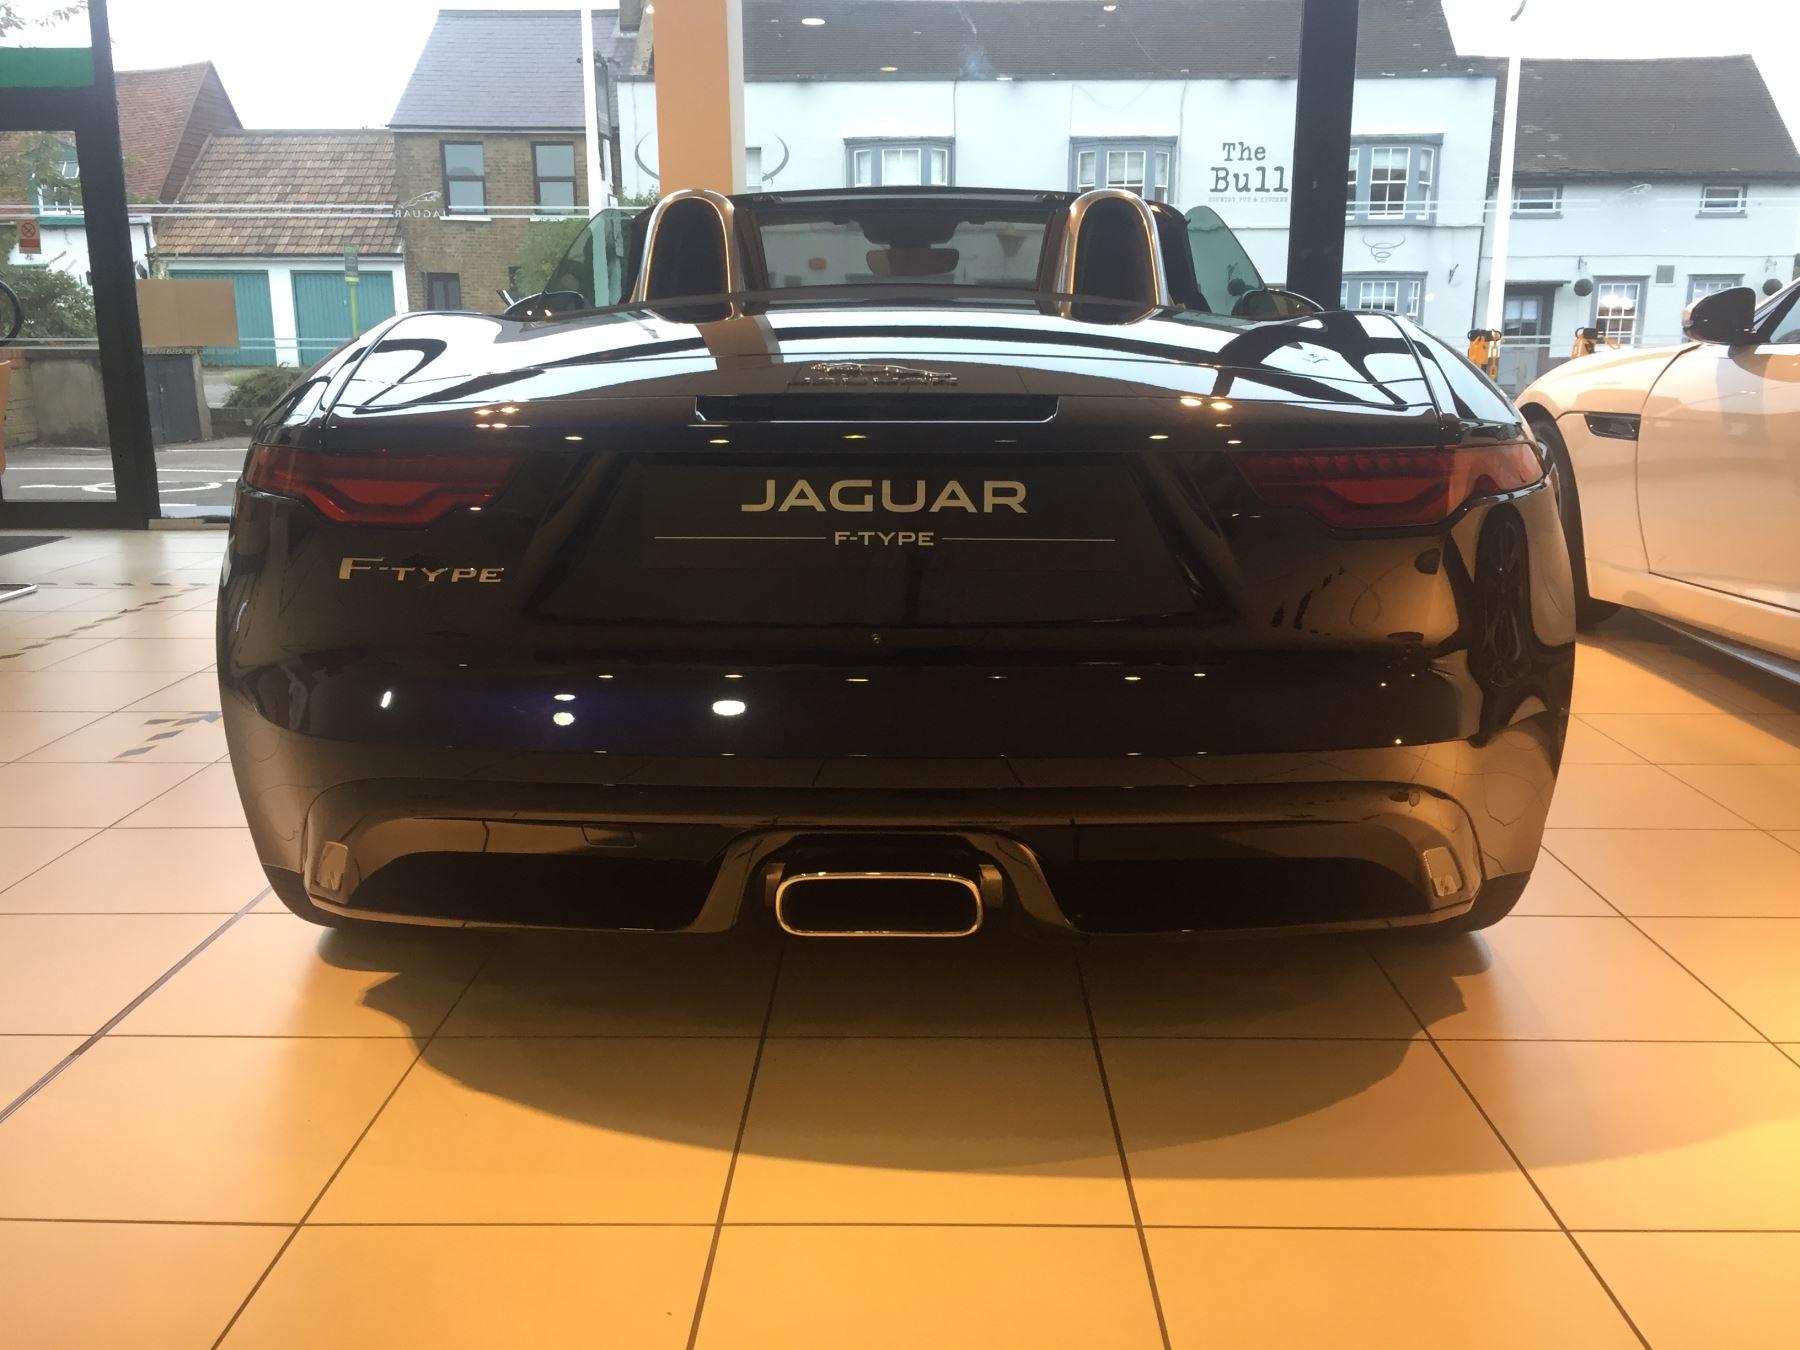 Jaguar F-TYPE 2.0 P300 R-Dynamic image 15